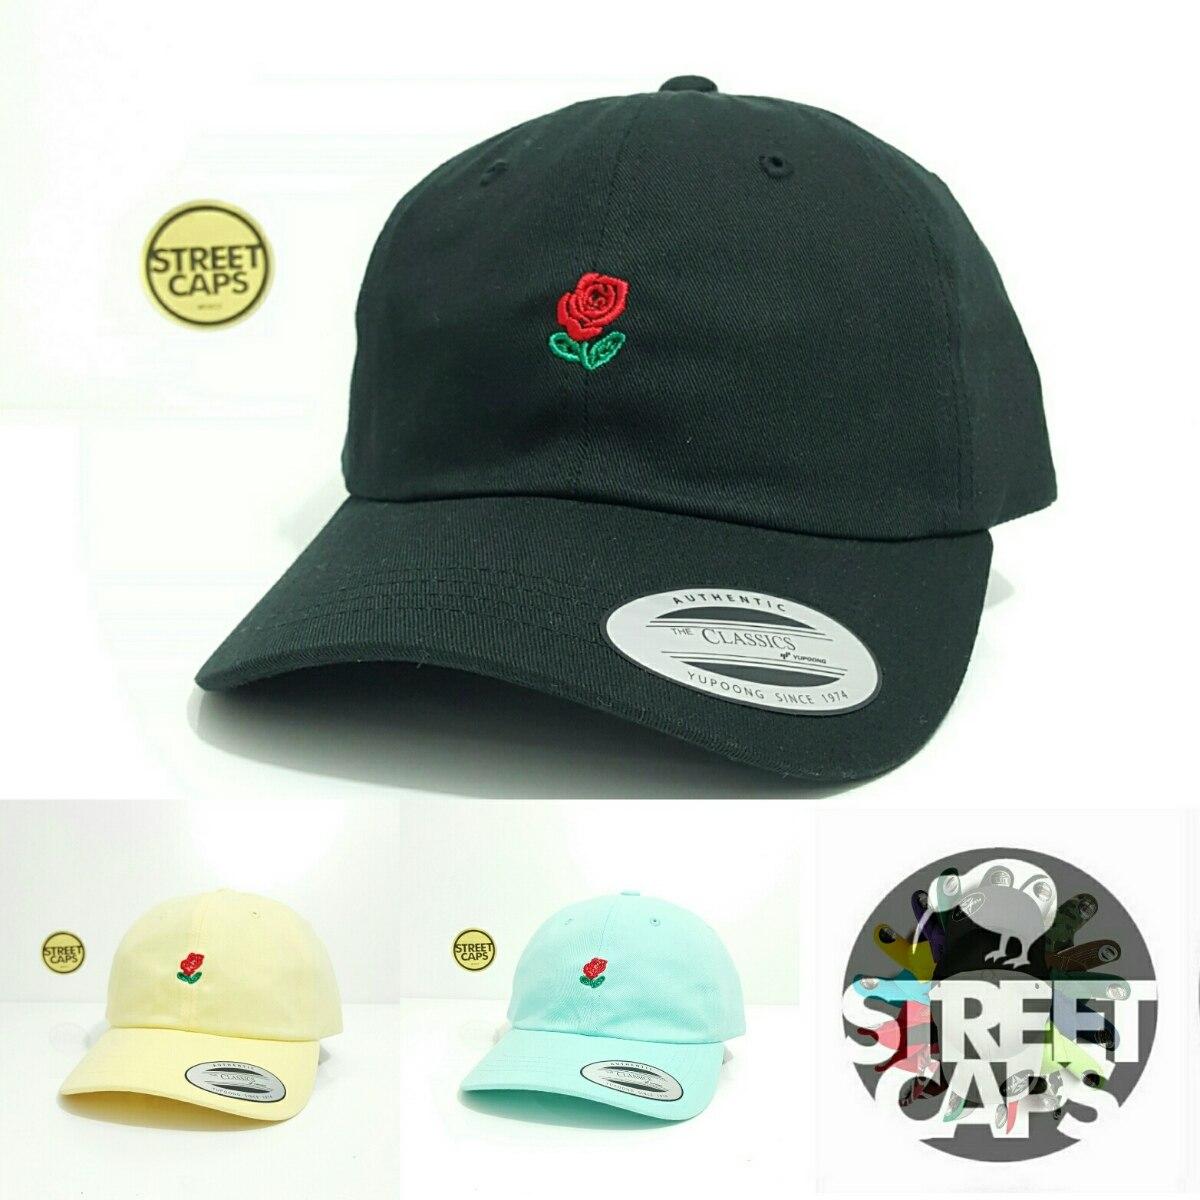 Gorra Yupoong The Classic Strapback Roses -   380.00 en Mercado Libre 10de3b4f7bf